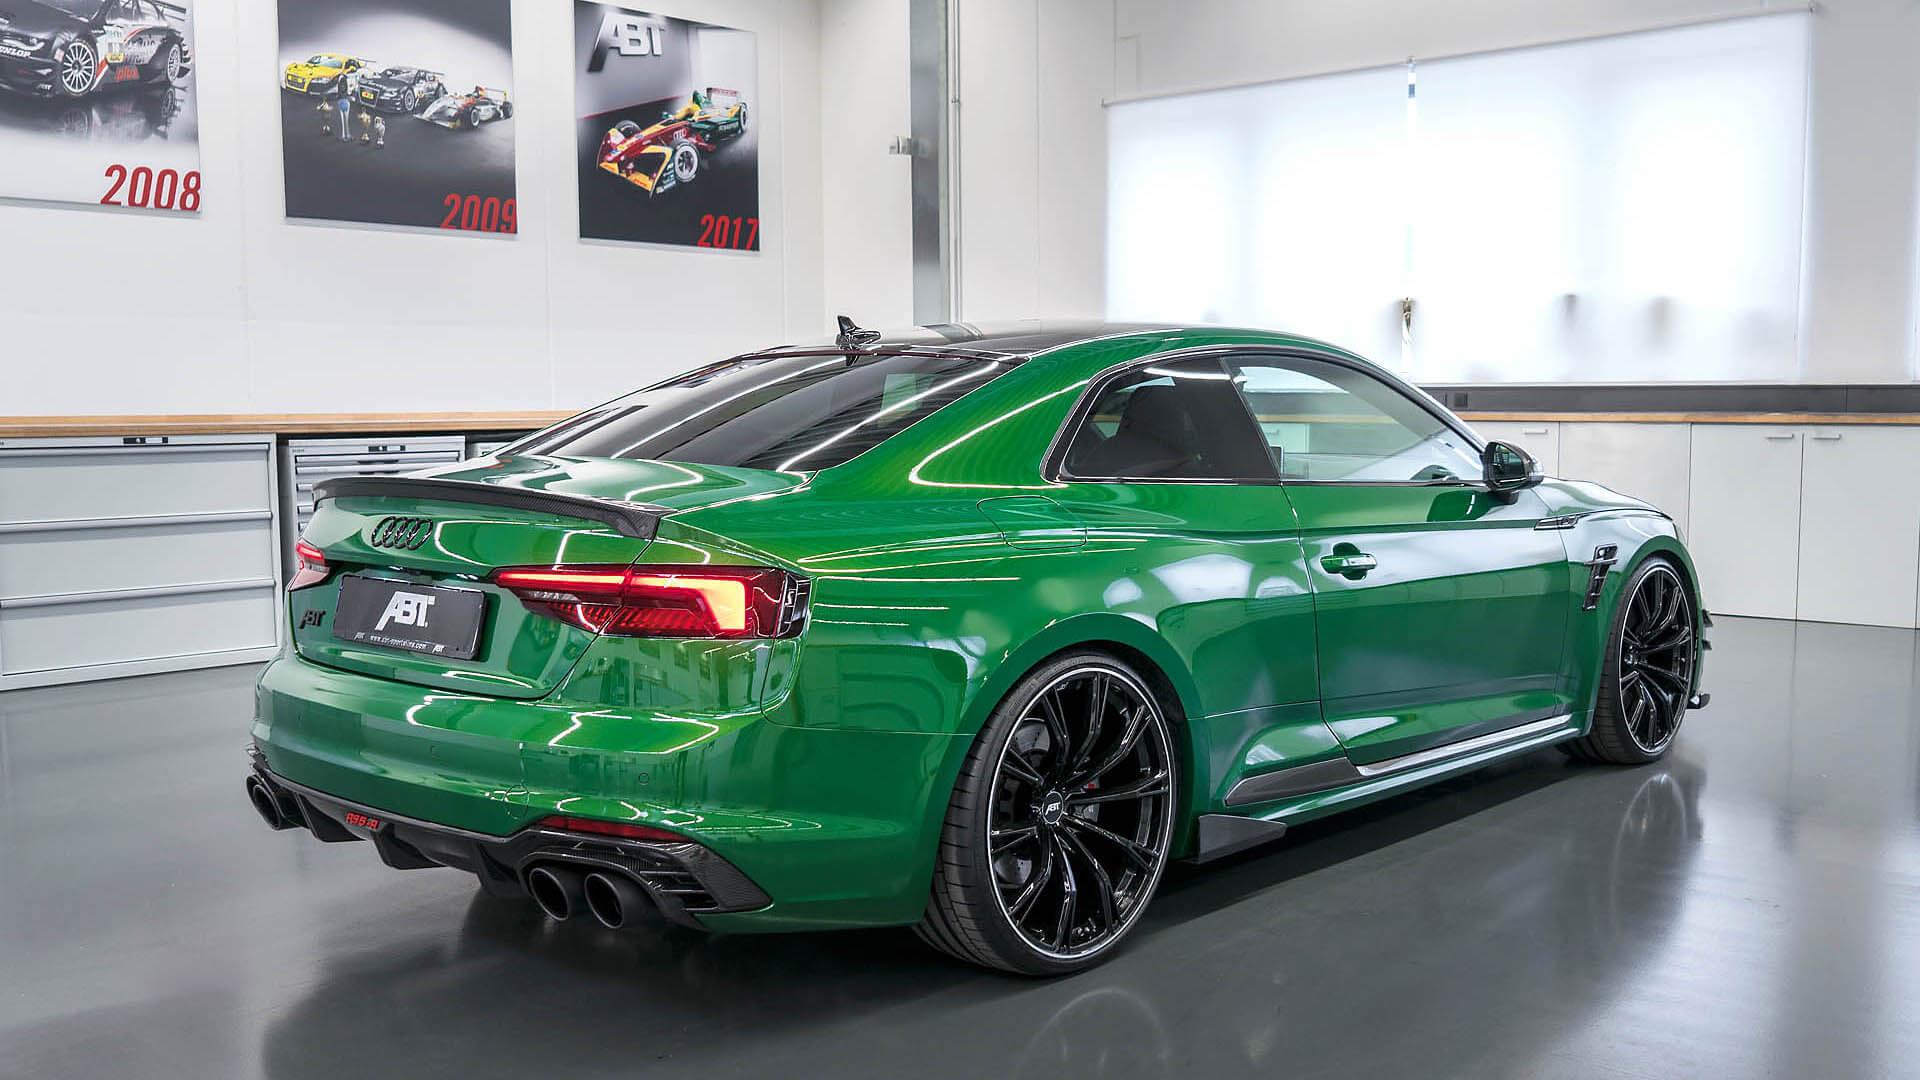 Abt Rs5 R Mehr Gaudi Im Audi